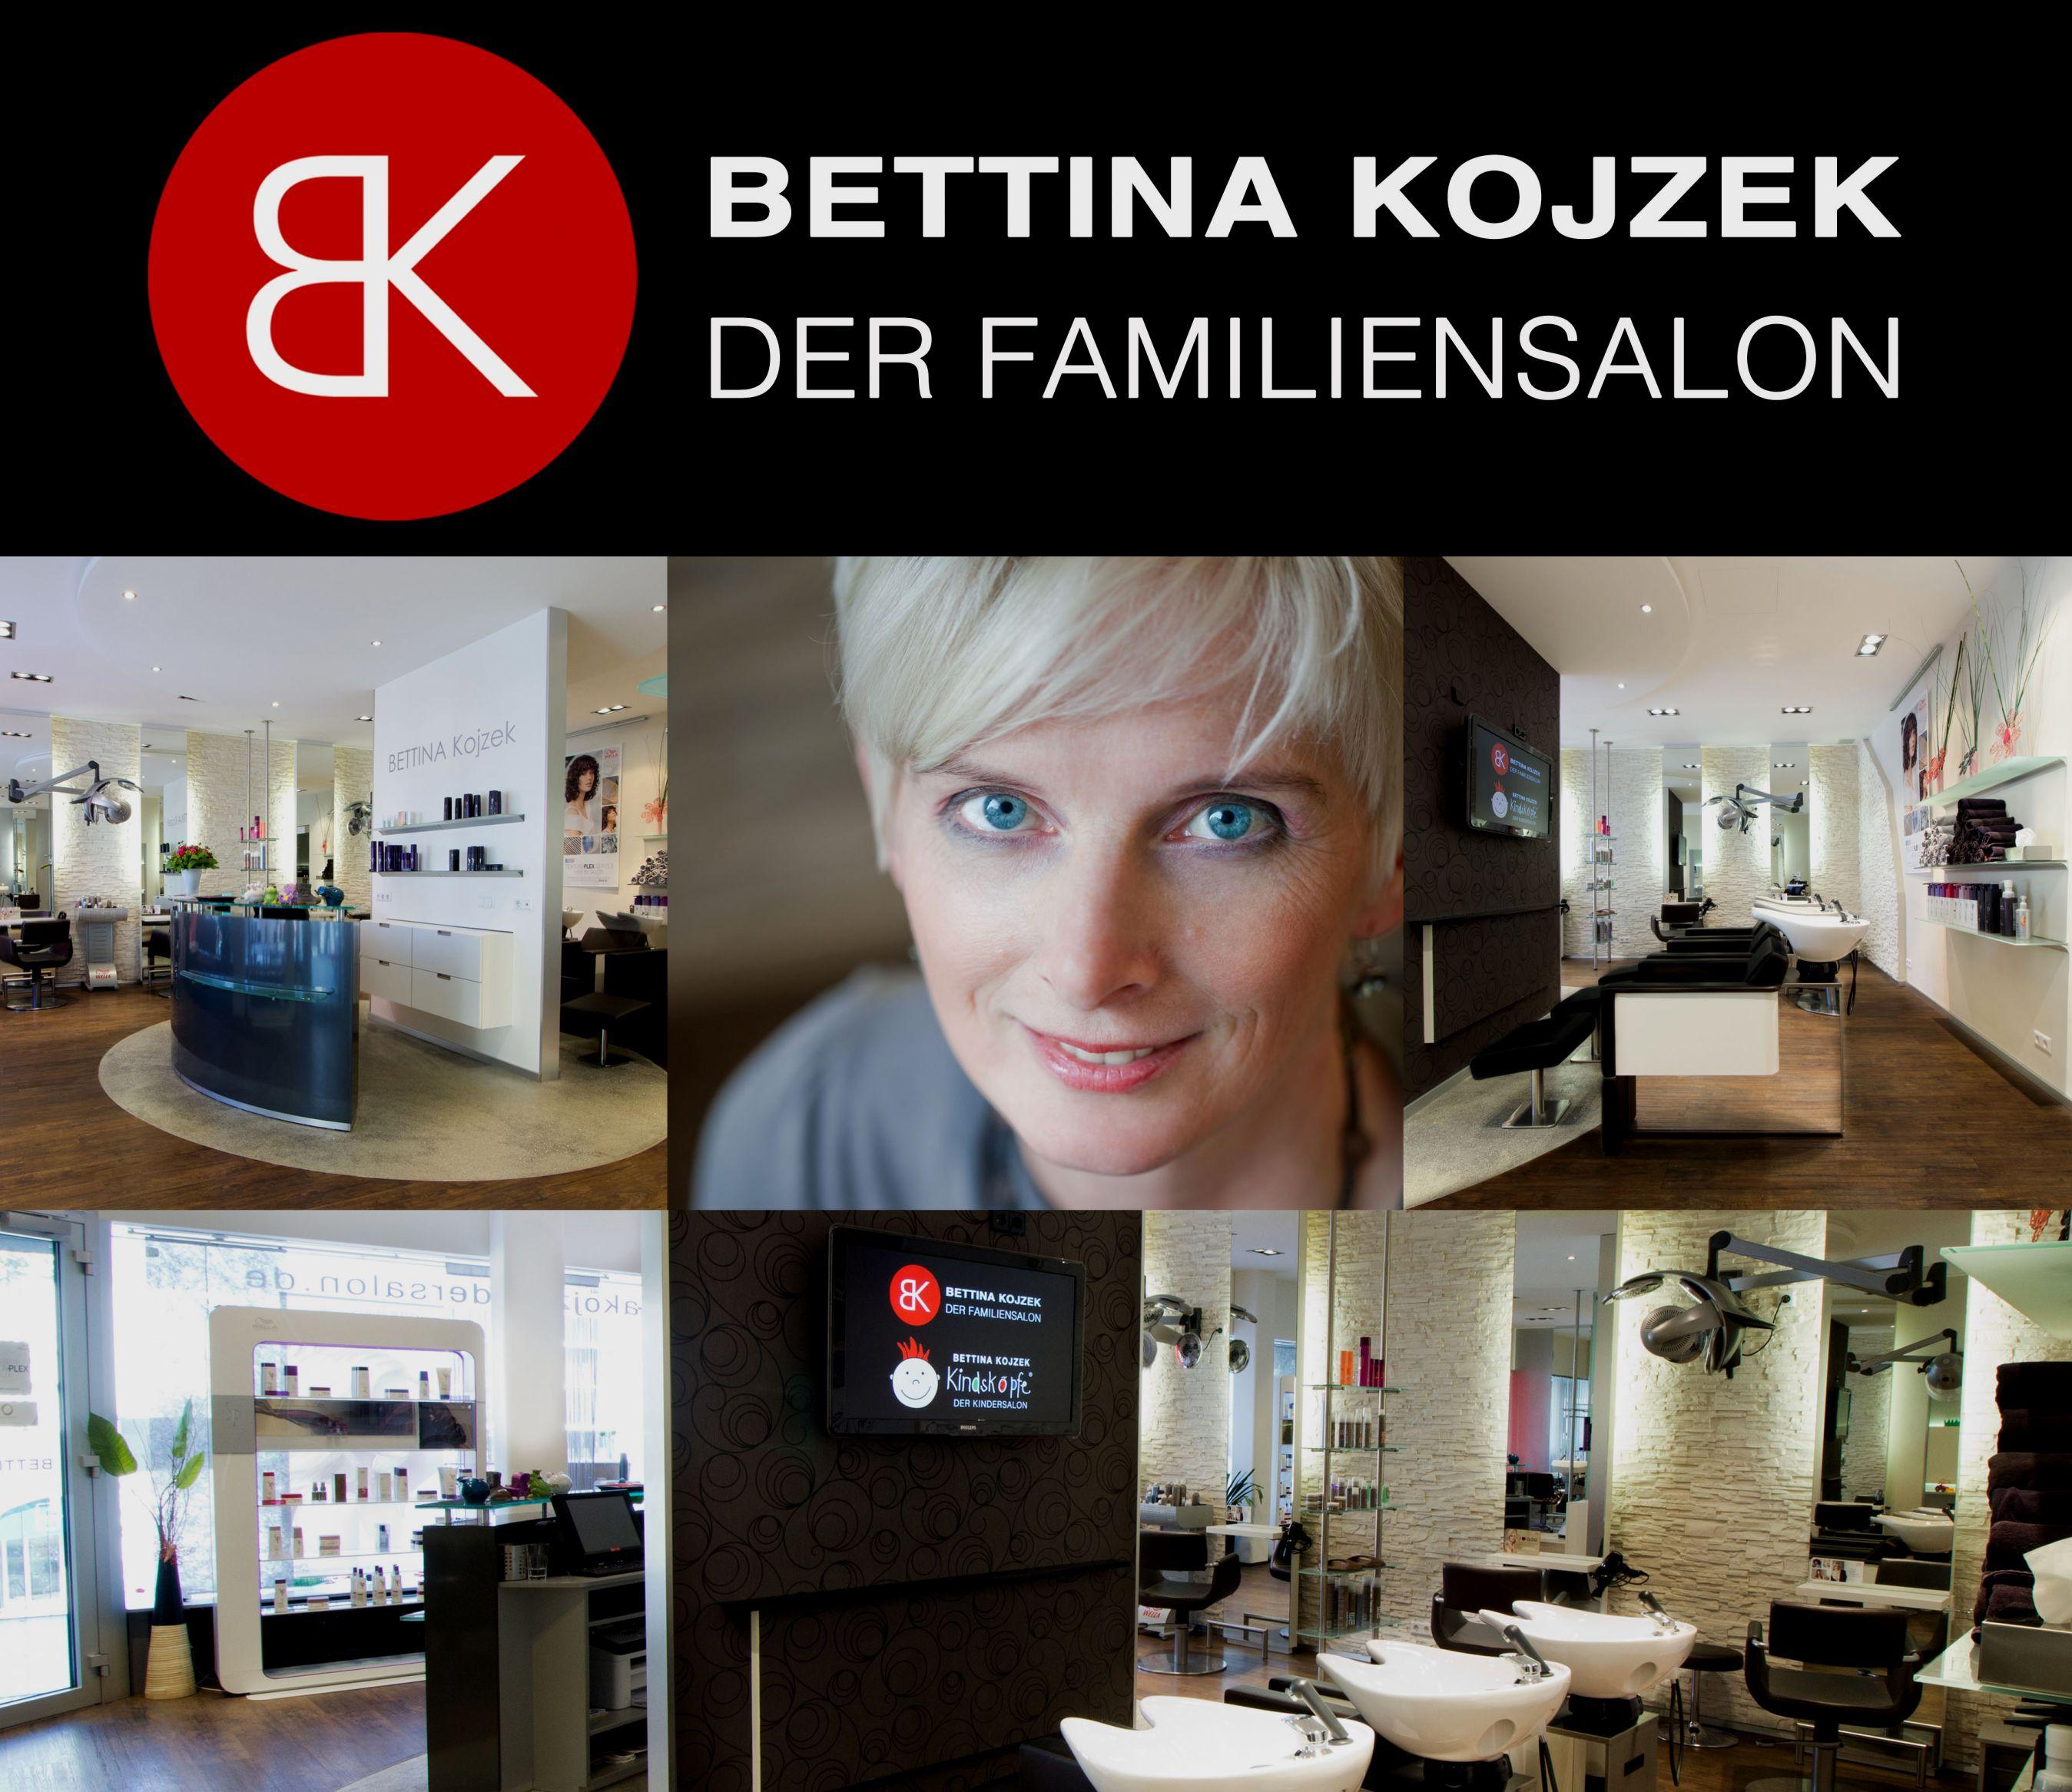 Bettina Kojzek - der Salon